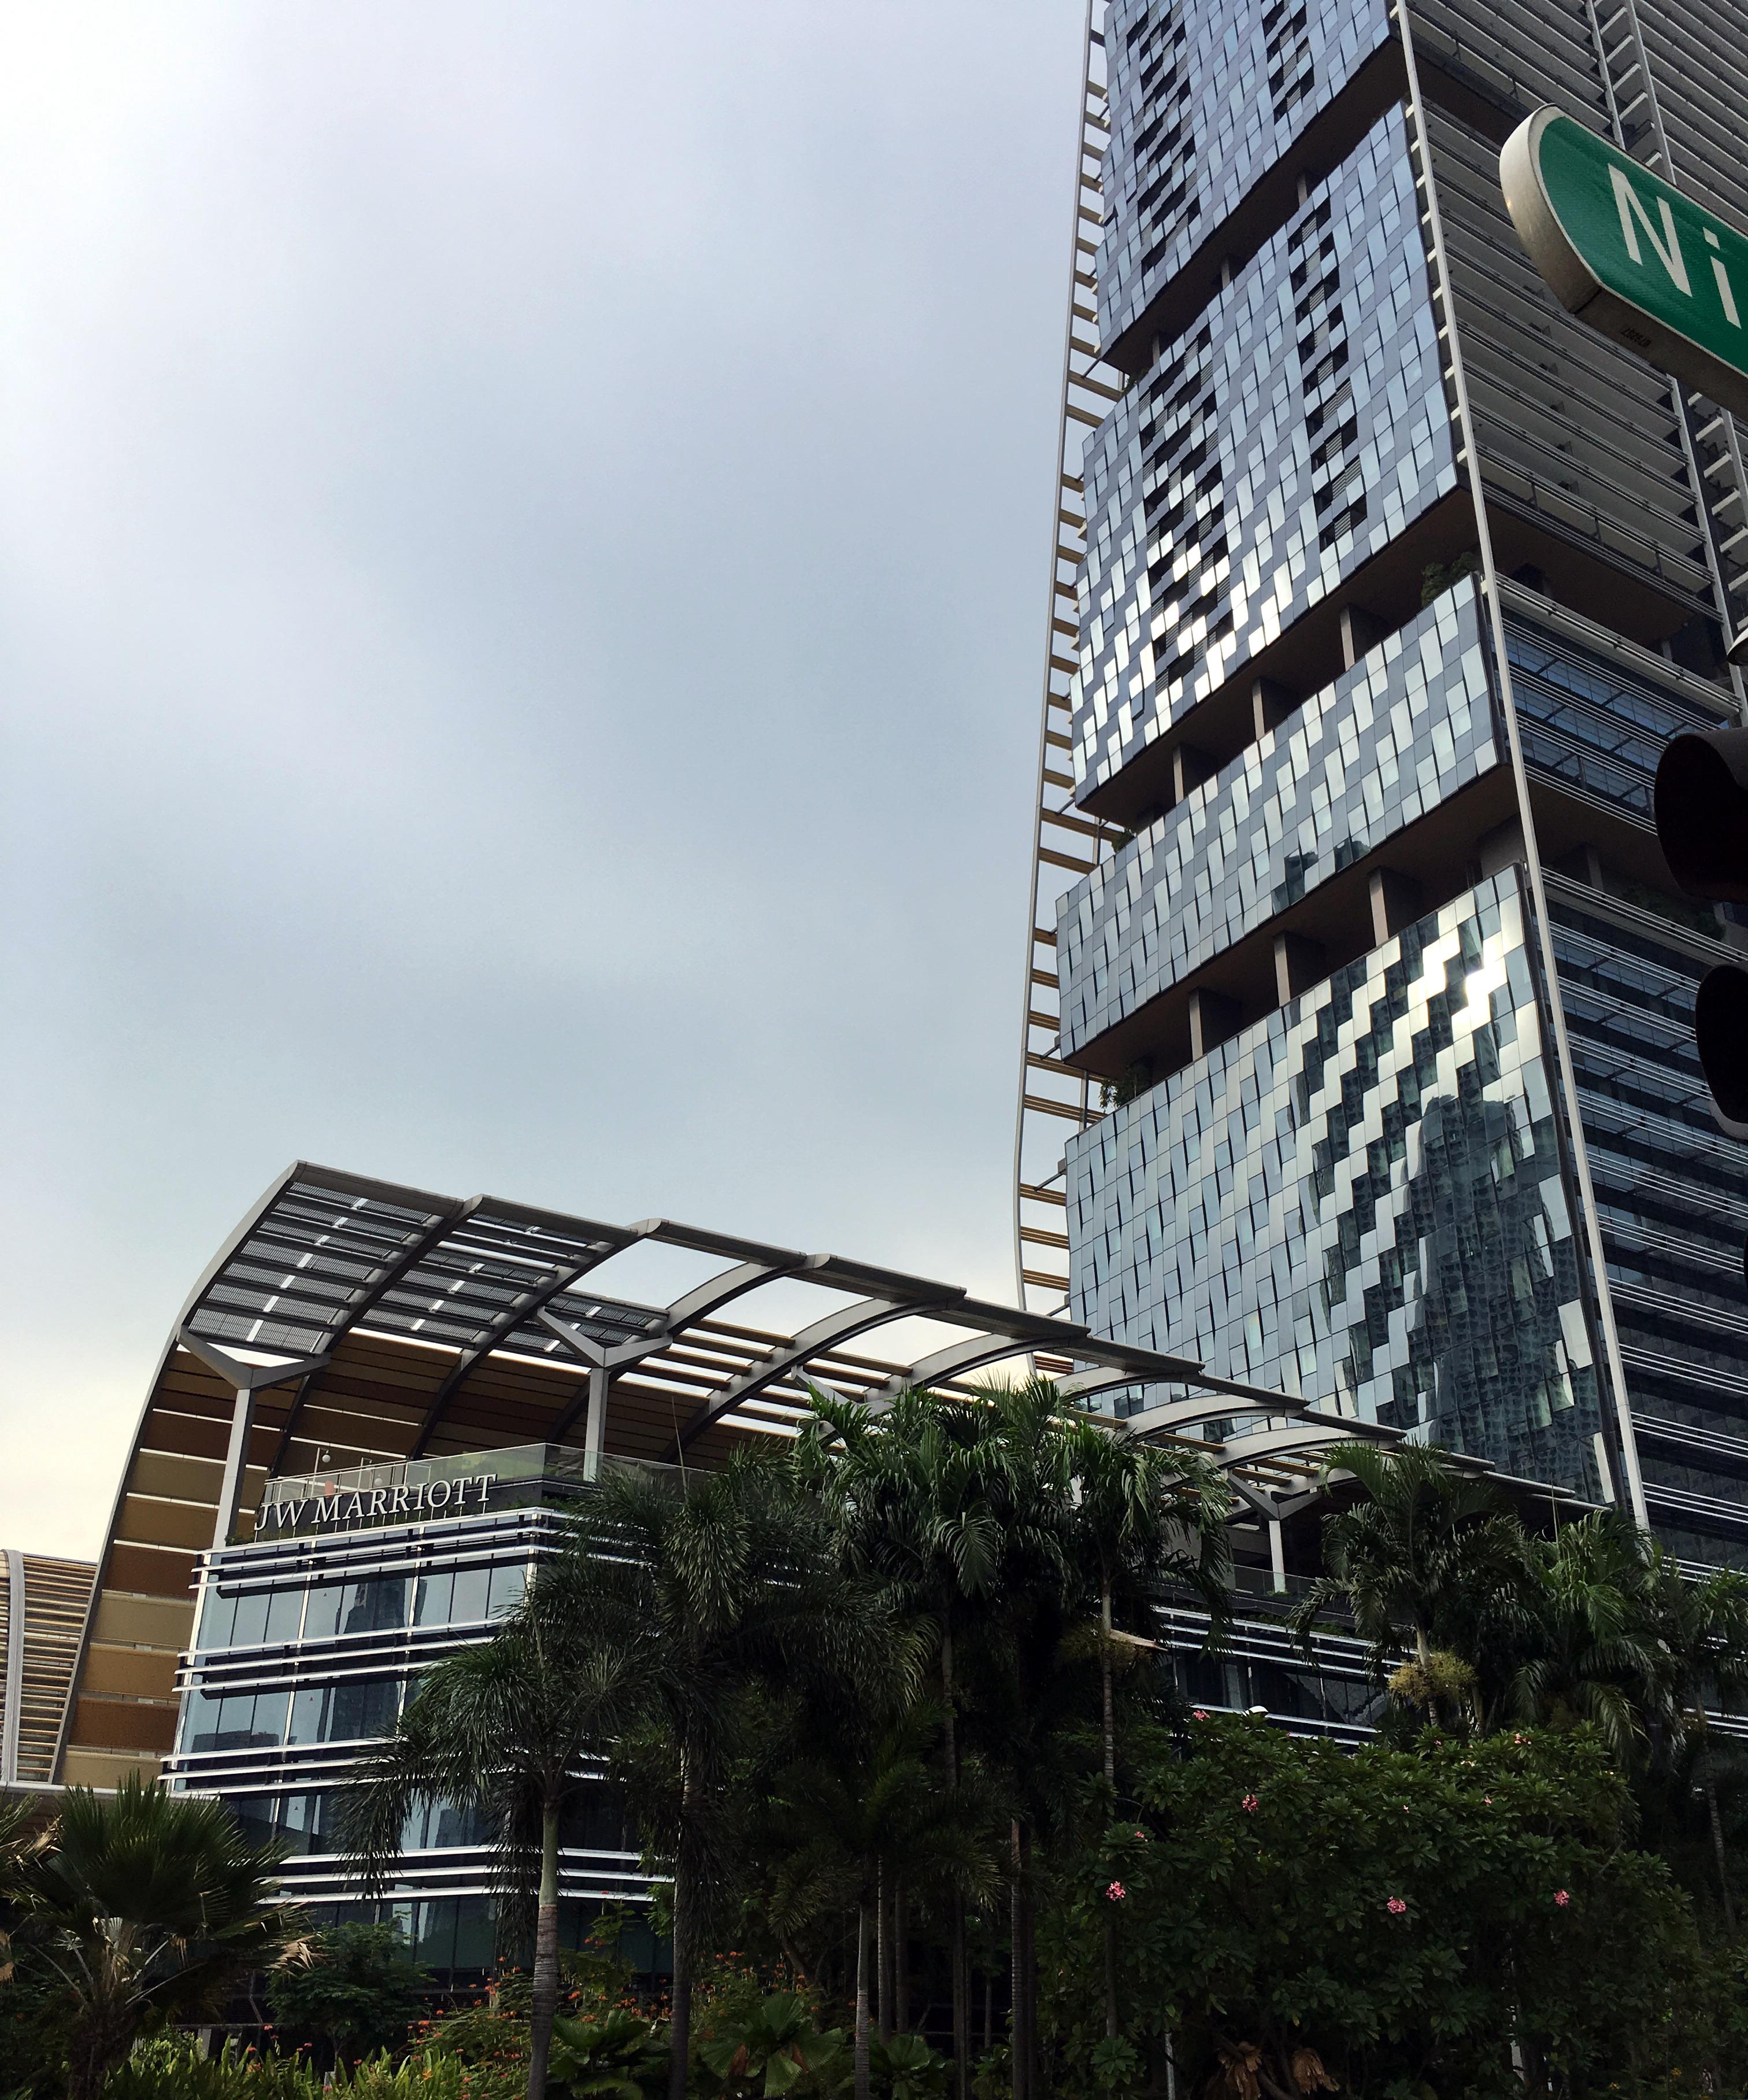 Jw Marriott Hotels Wikiwand